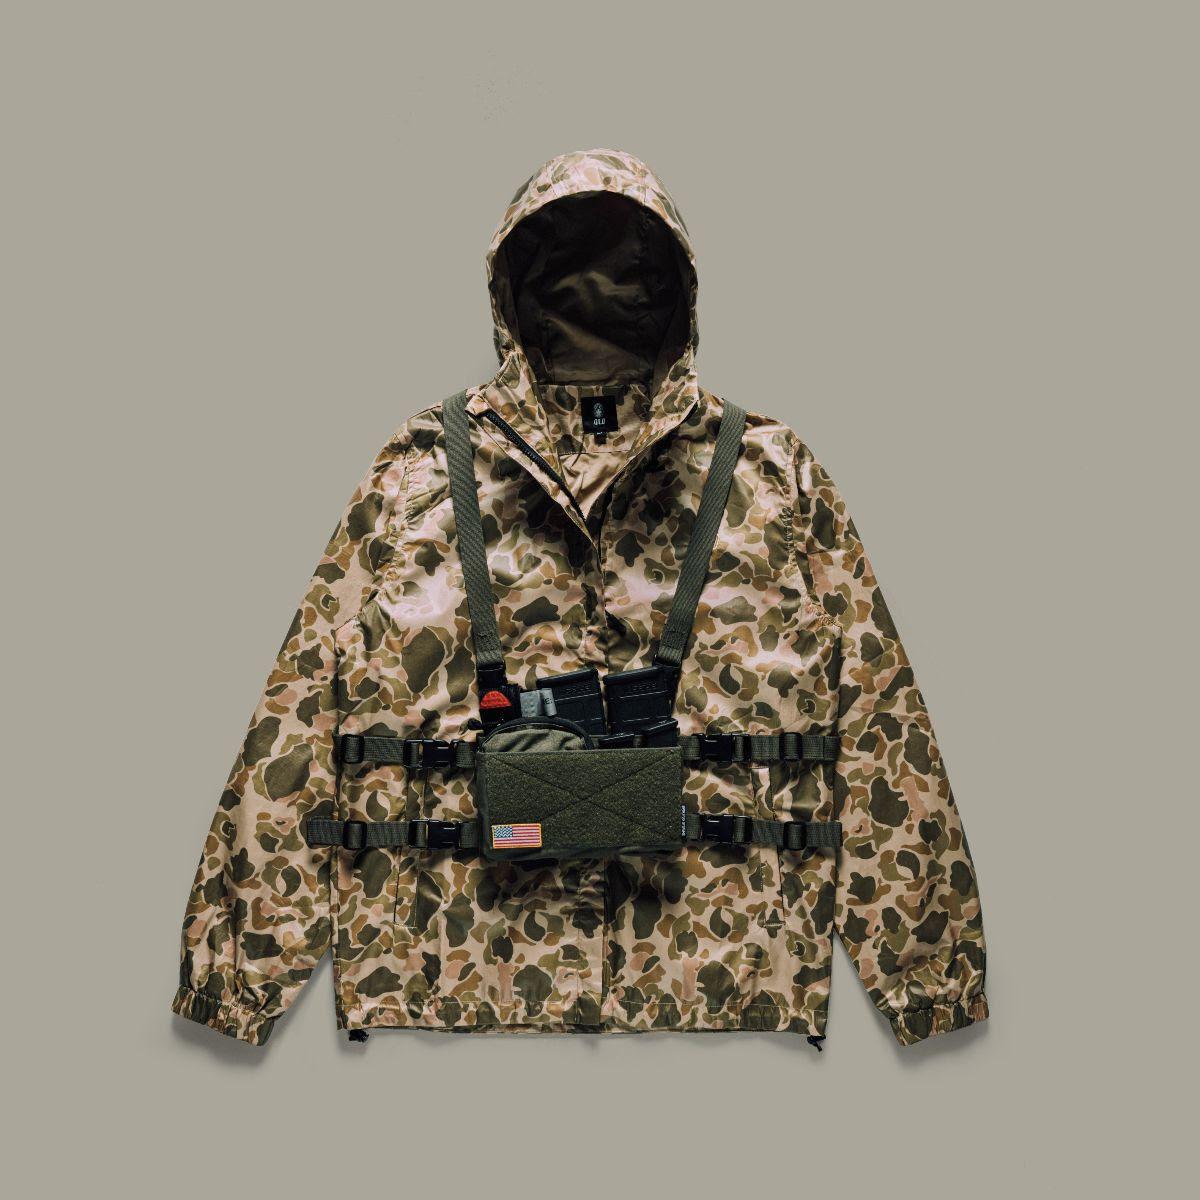 qilo Tactical wrmfzy frogskin cammo print breaker parka